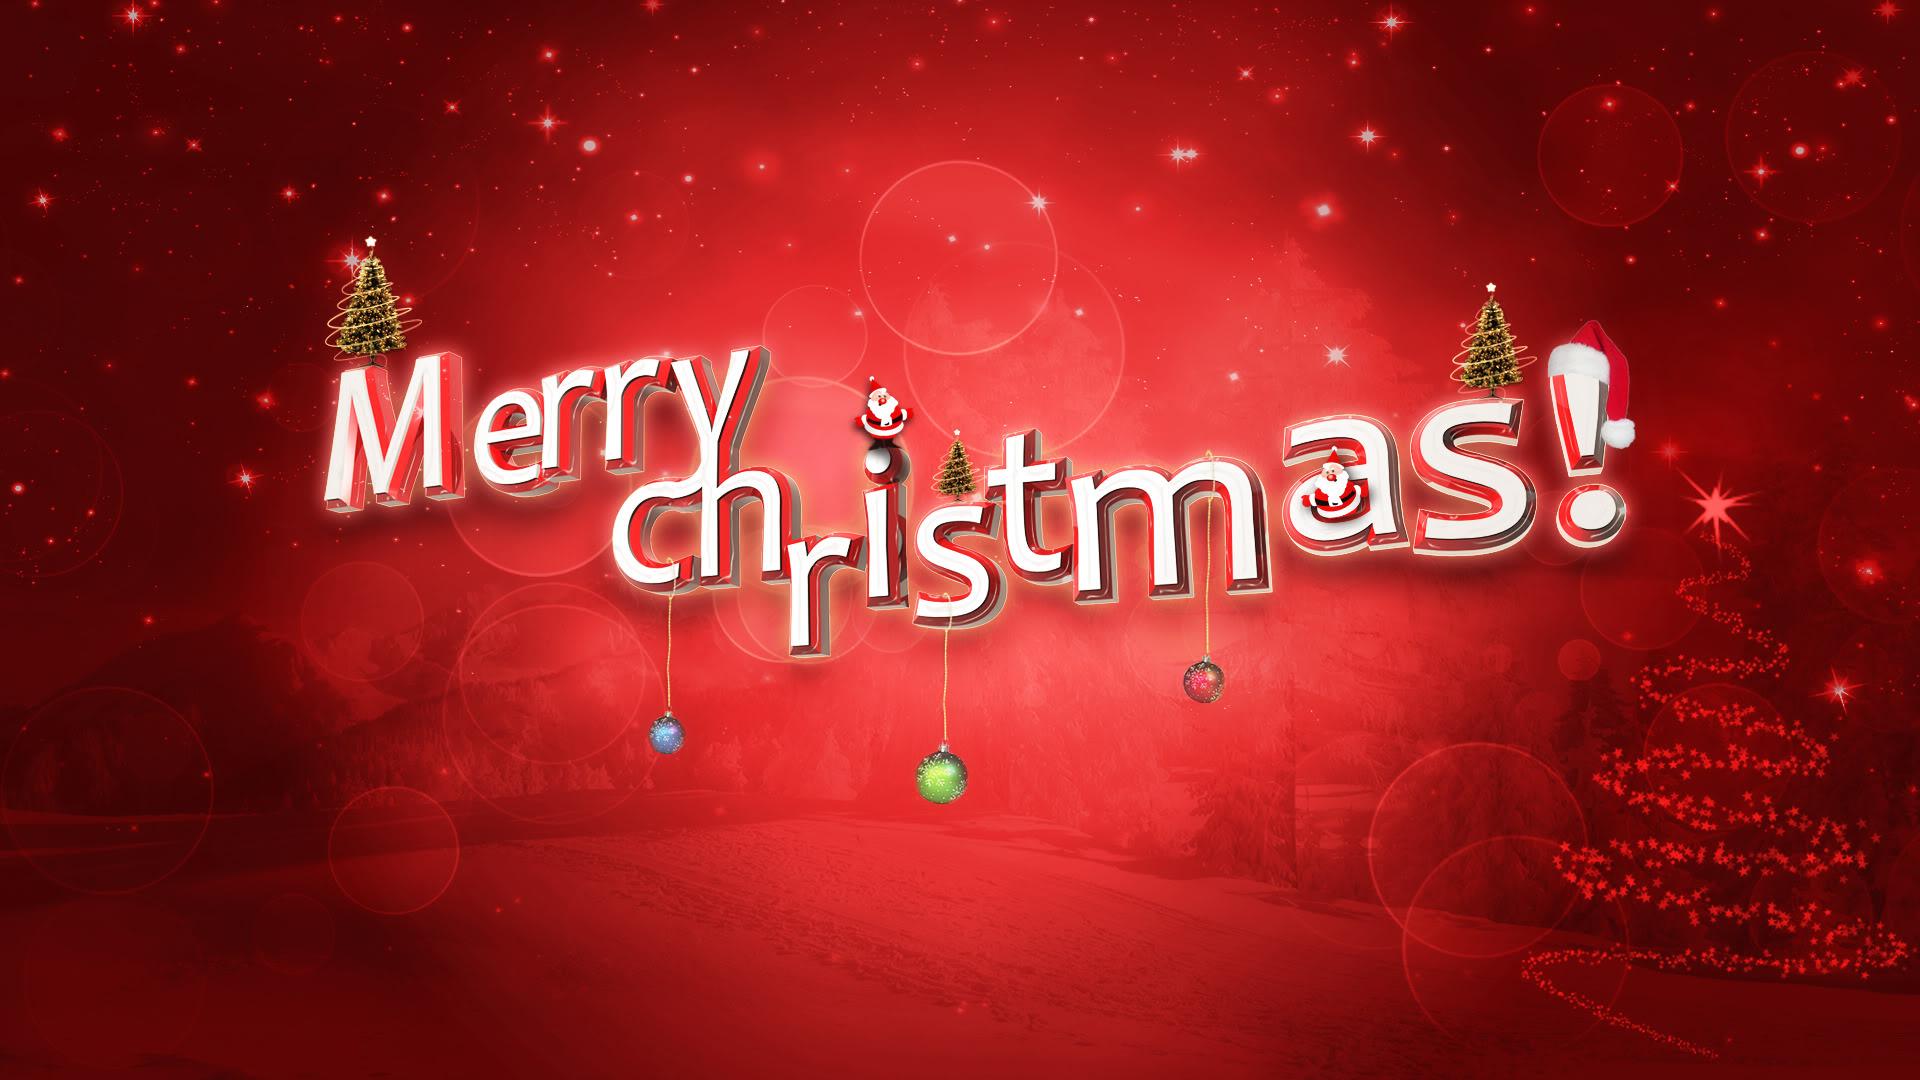 hd-wallpaper-of-merry-christmas-61